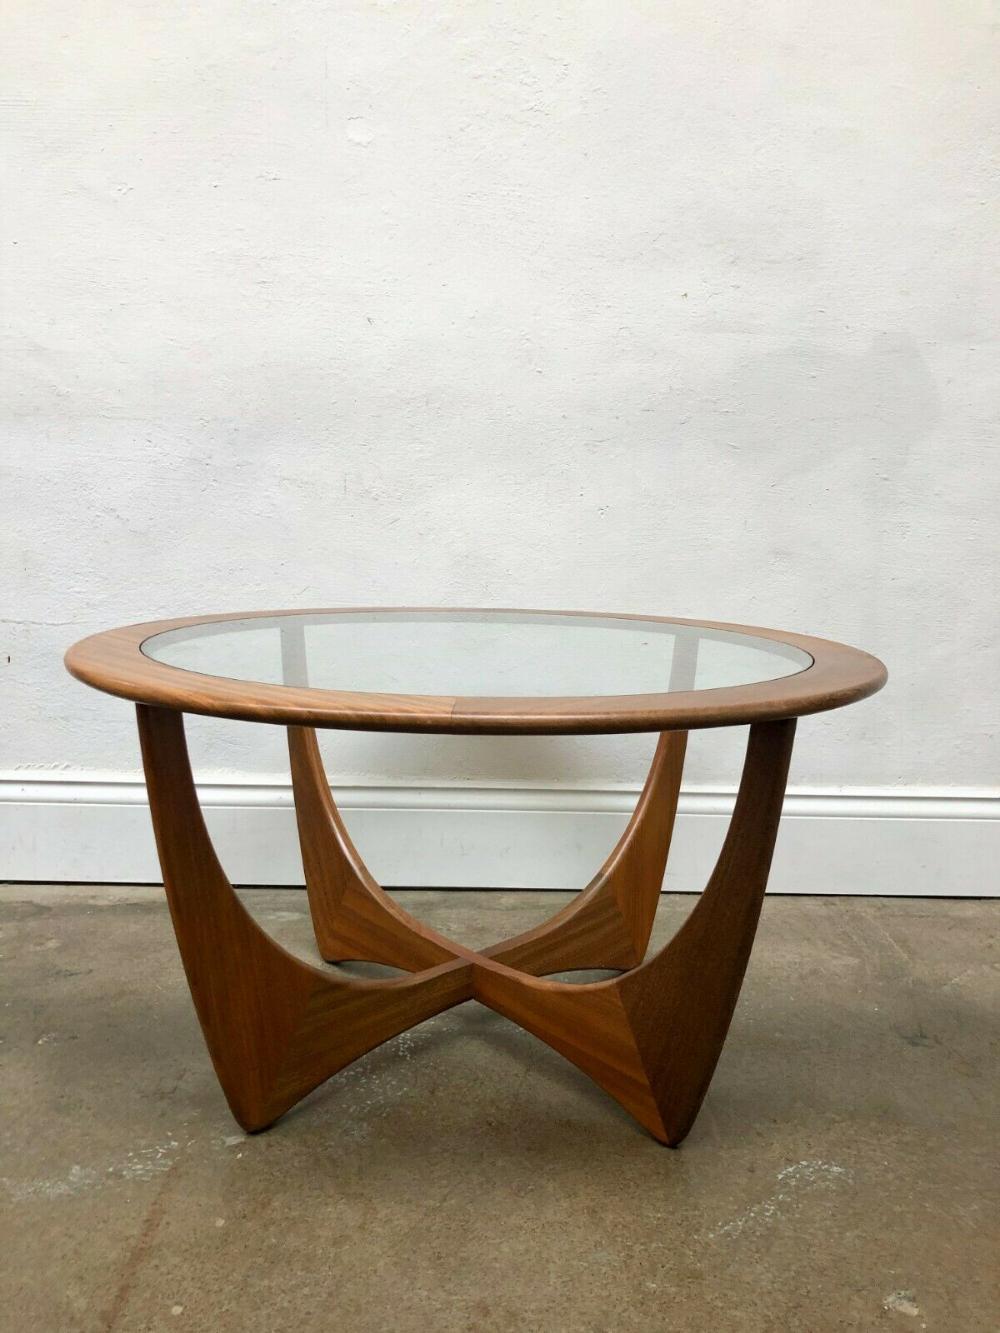 Vintage 1960s G Plan Round Astro Teak Coffee Table Danish Retro Mid Century Vinterior Teak Coffee Table Coffee Table Retro Mid Century [ 1333 x 1000 Pixel ]